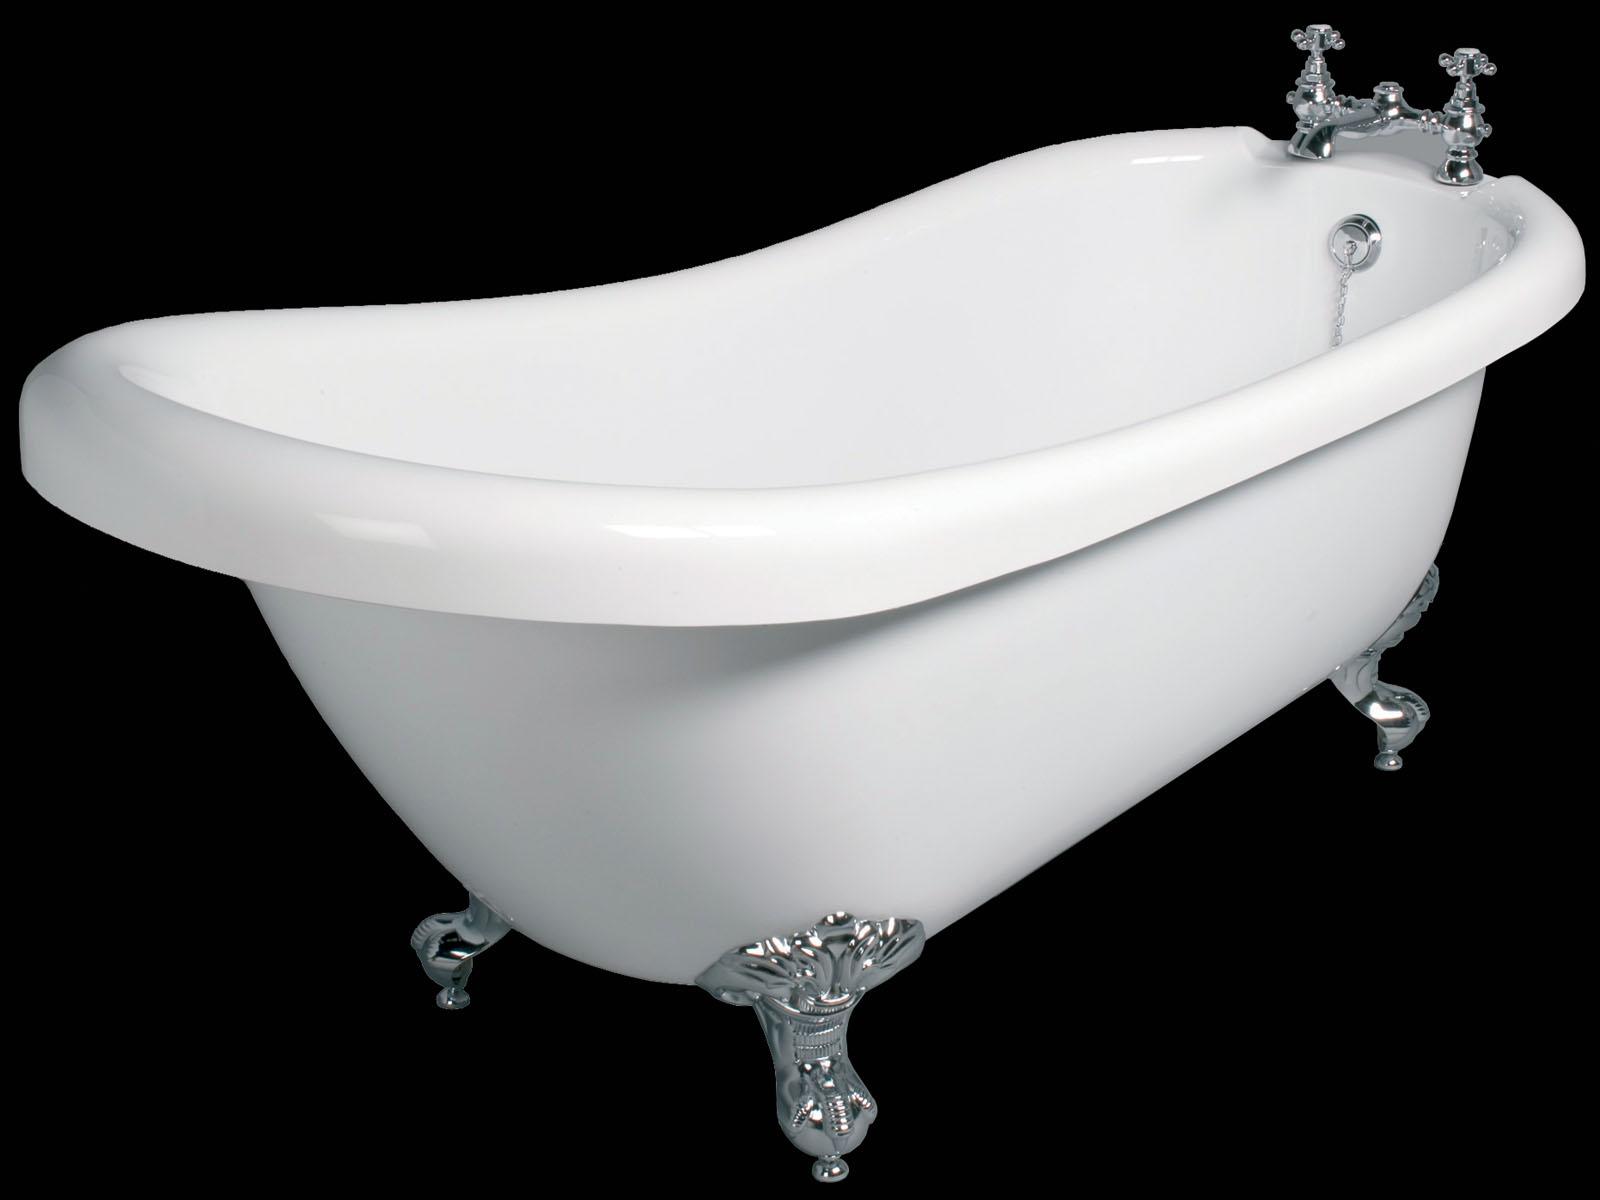 Vasca da bagno freestanding modello MARY